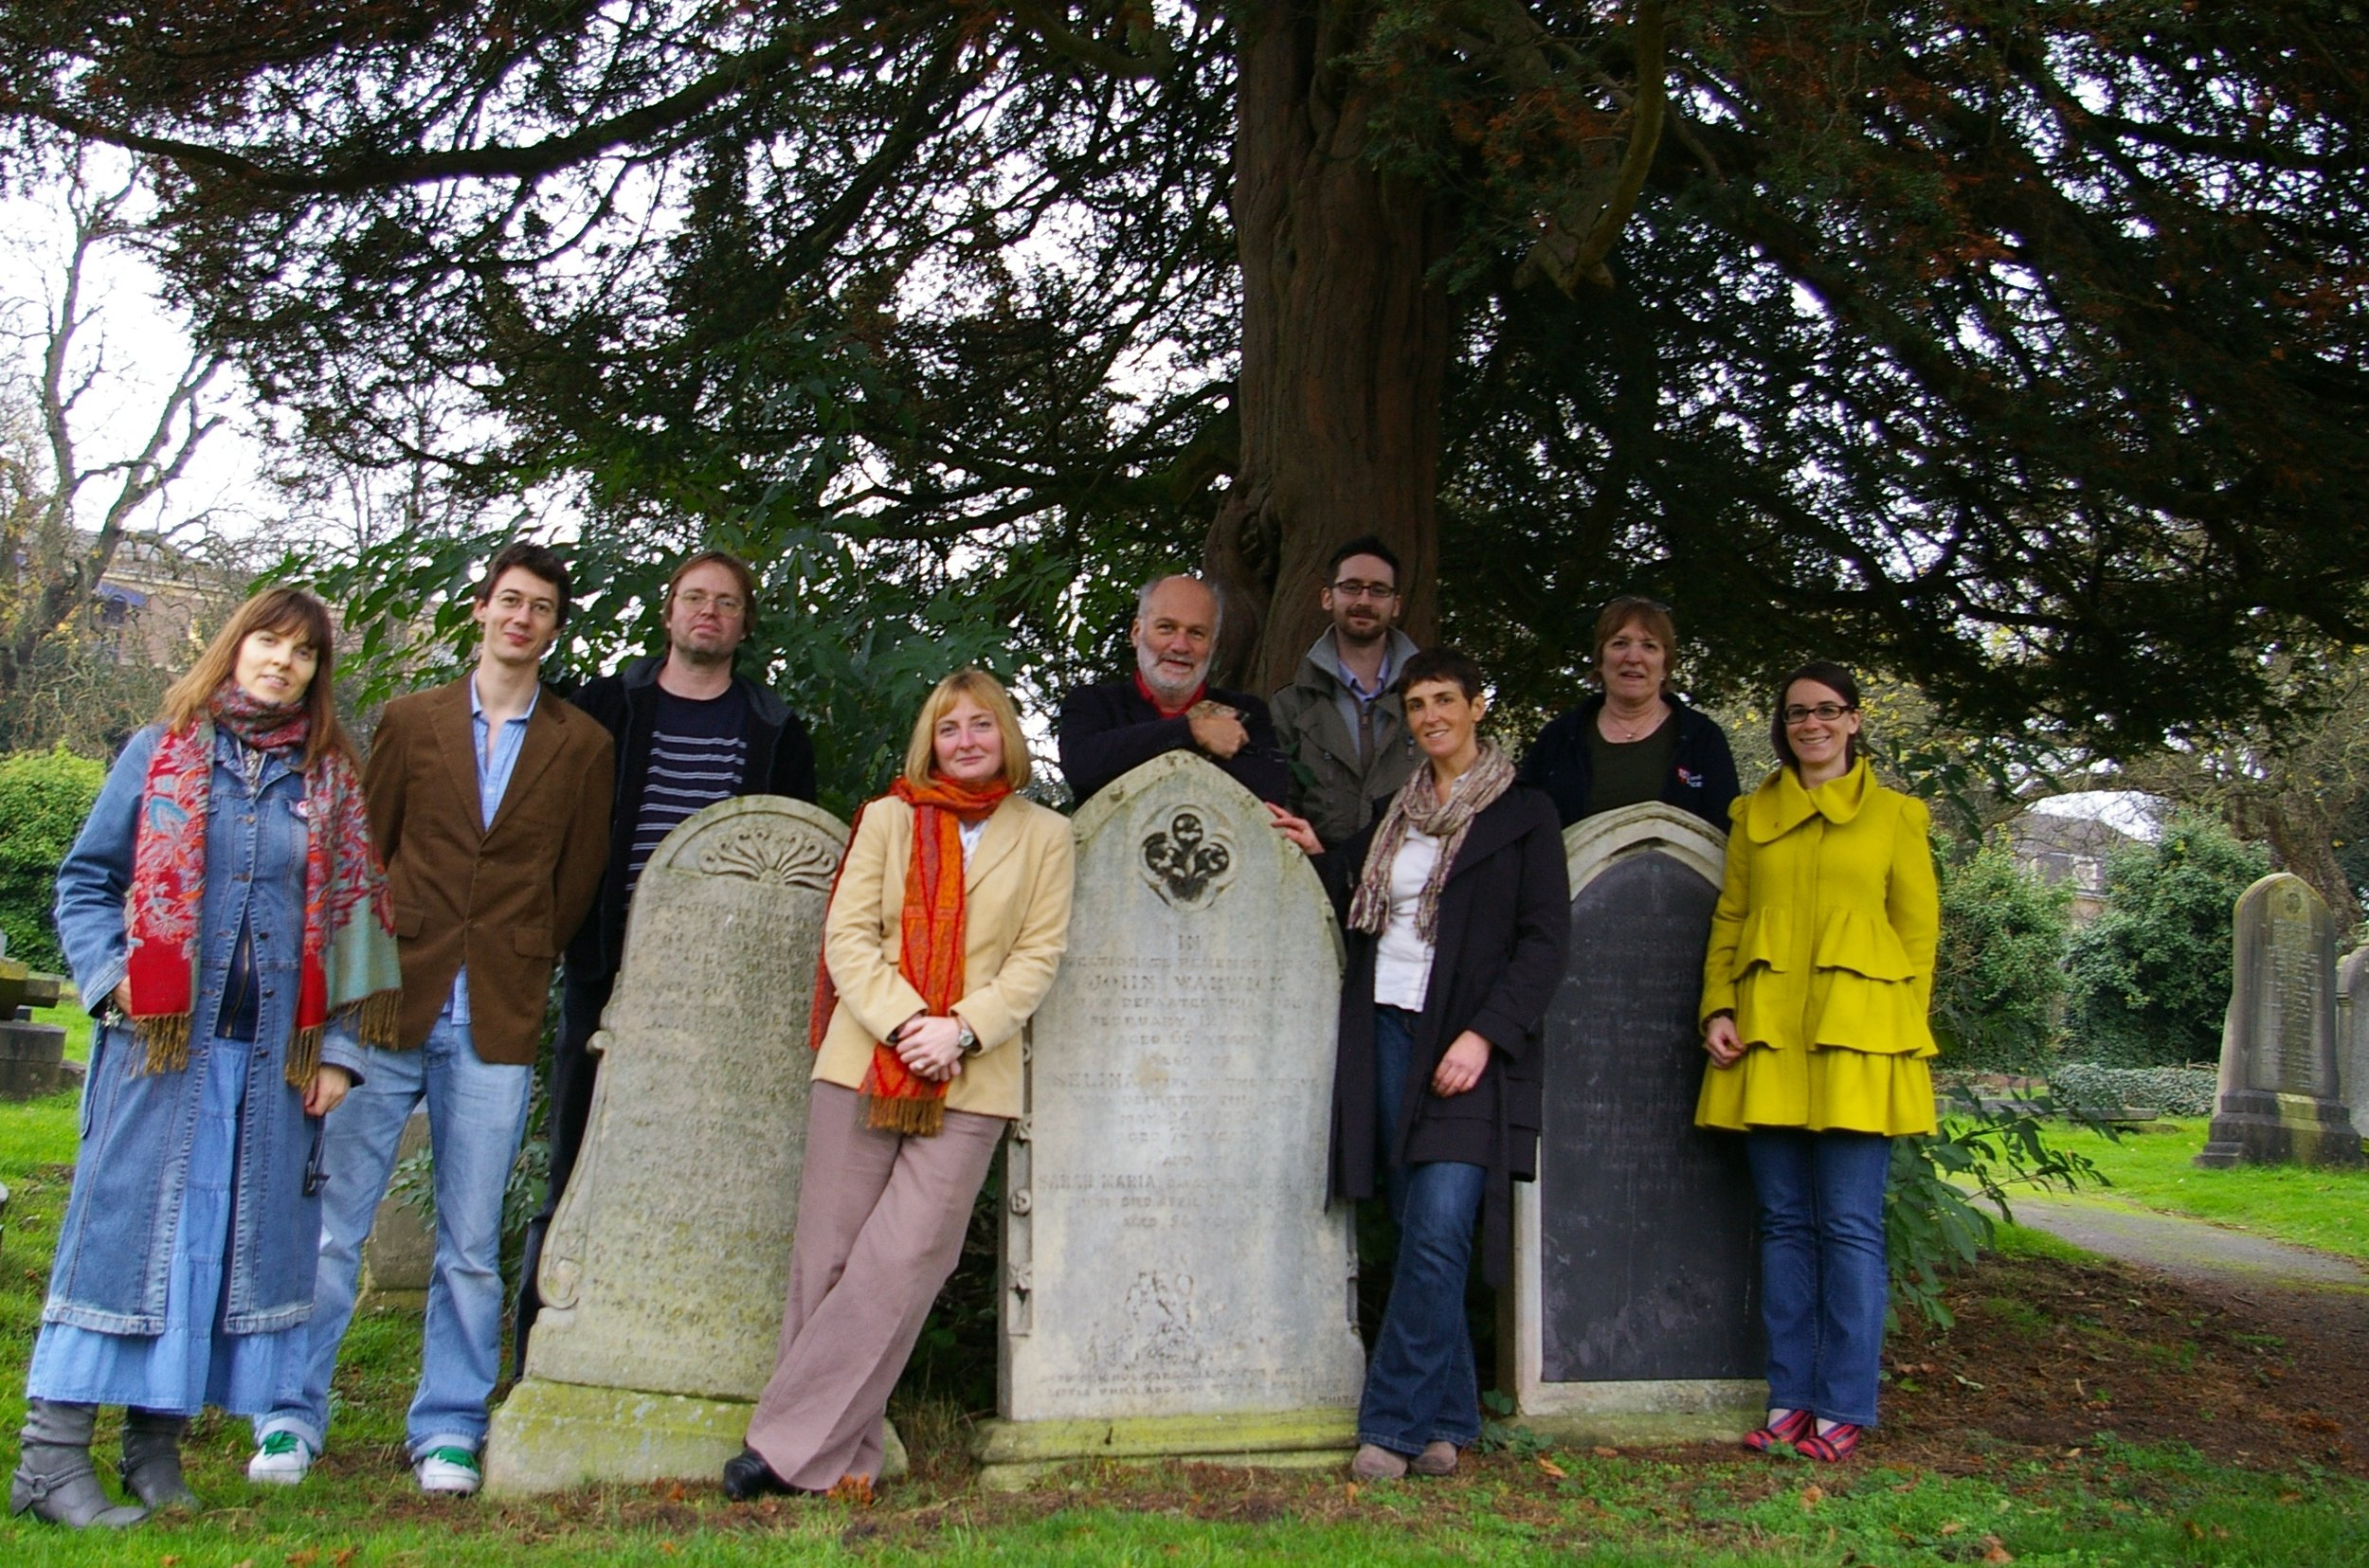 The team (l-r): Shane, Richard, Stephanie (our former Administrator), Owen, Elizabeth, Zoe, Pete, Sarah, Francesca. Floris, Rachel and Emma are not in this photo.